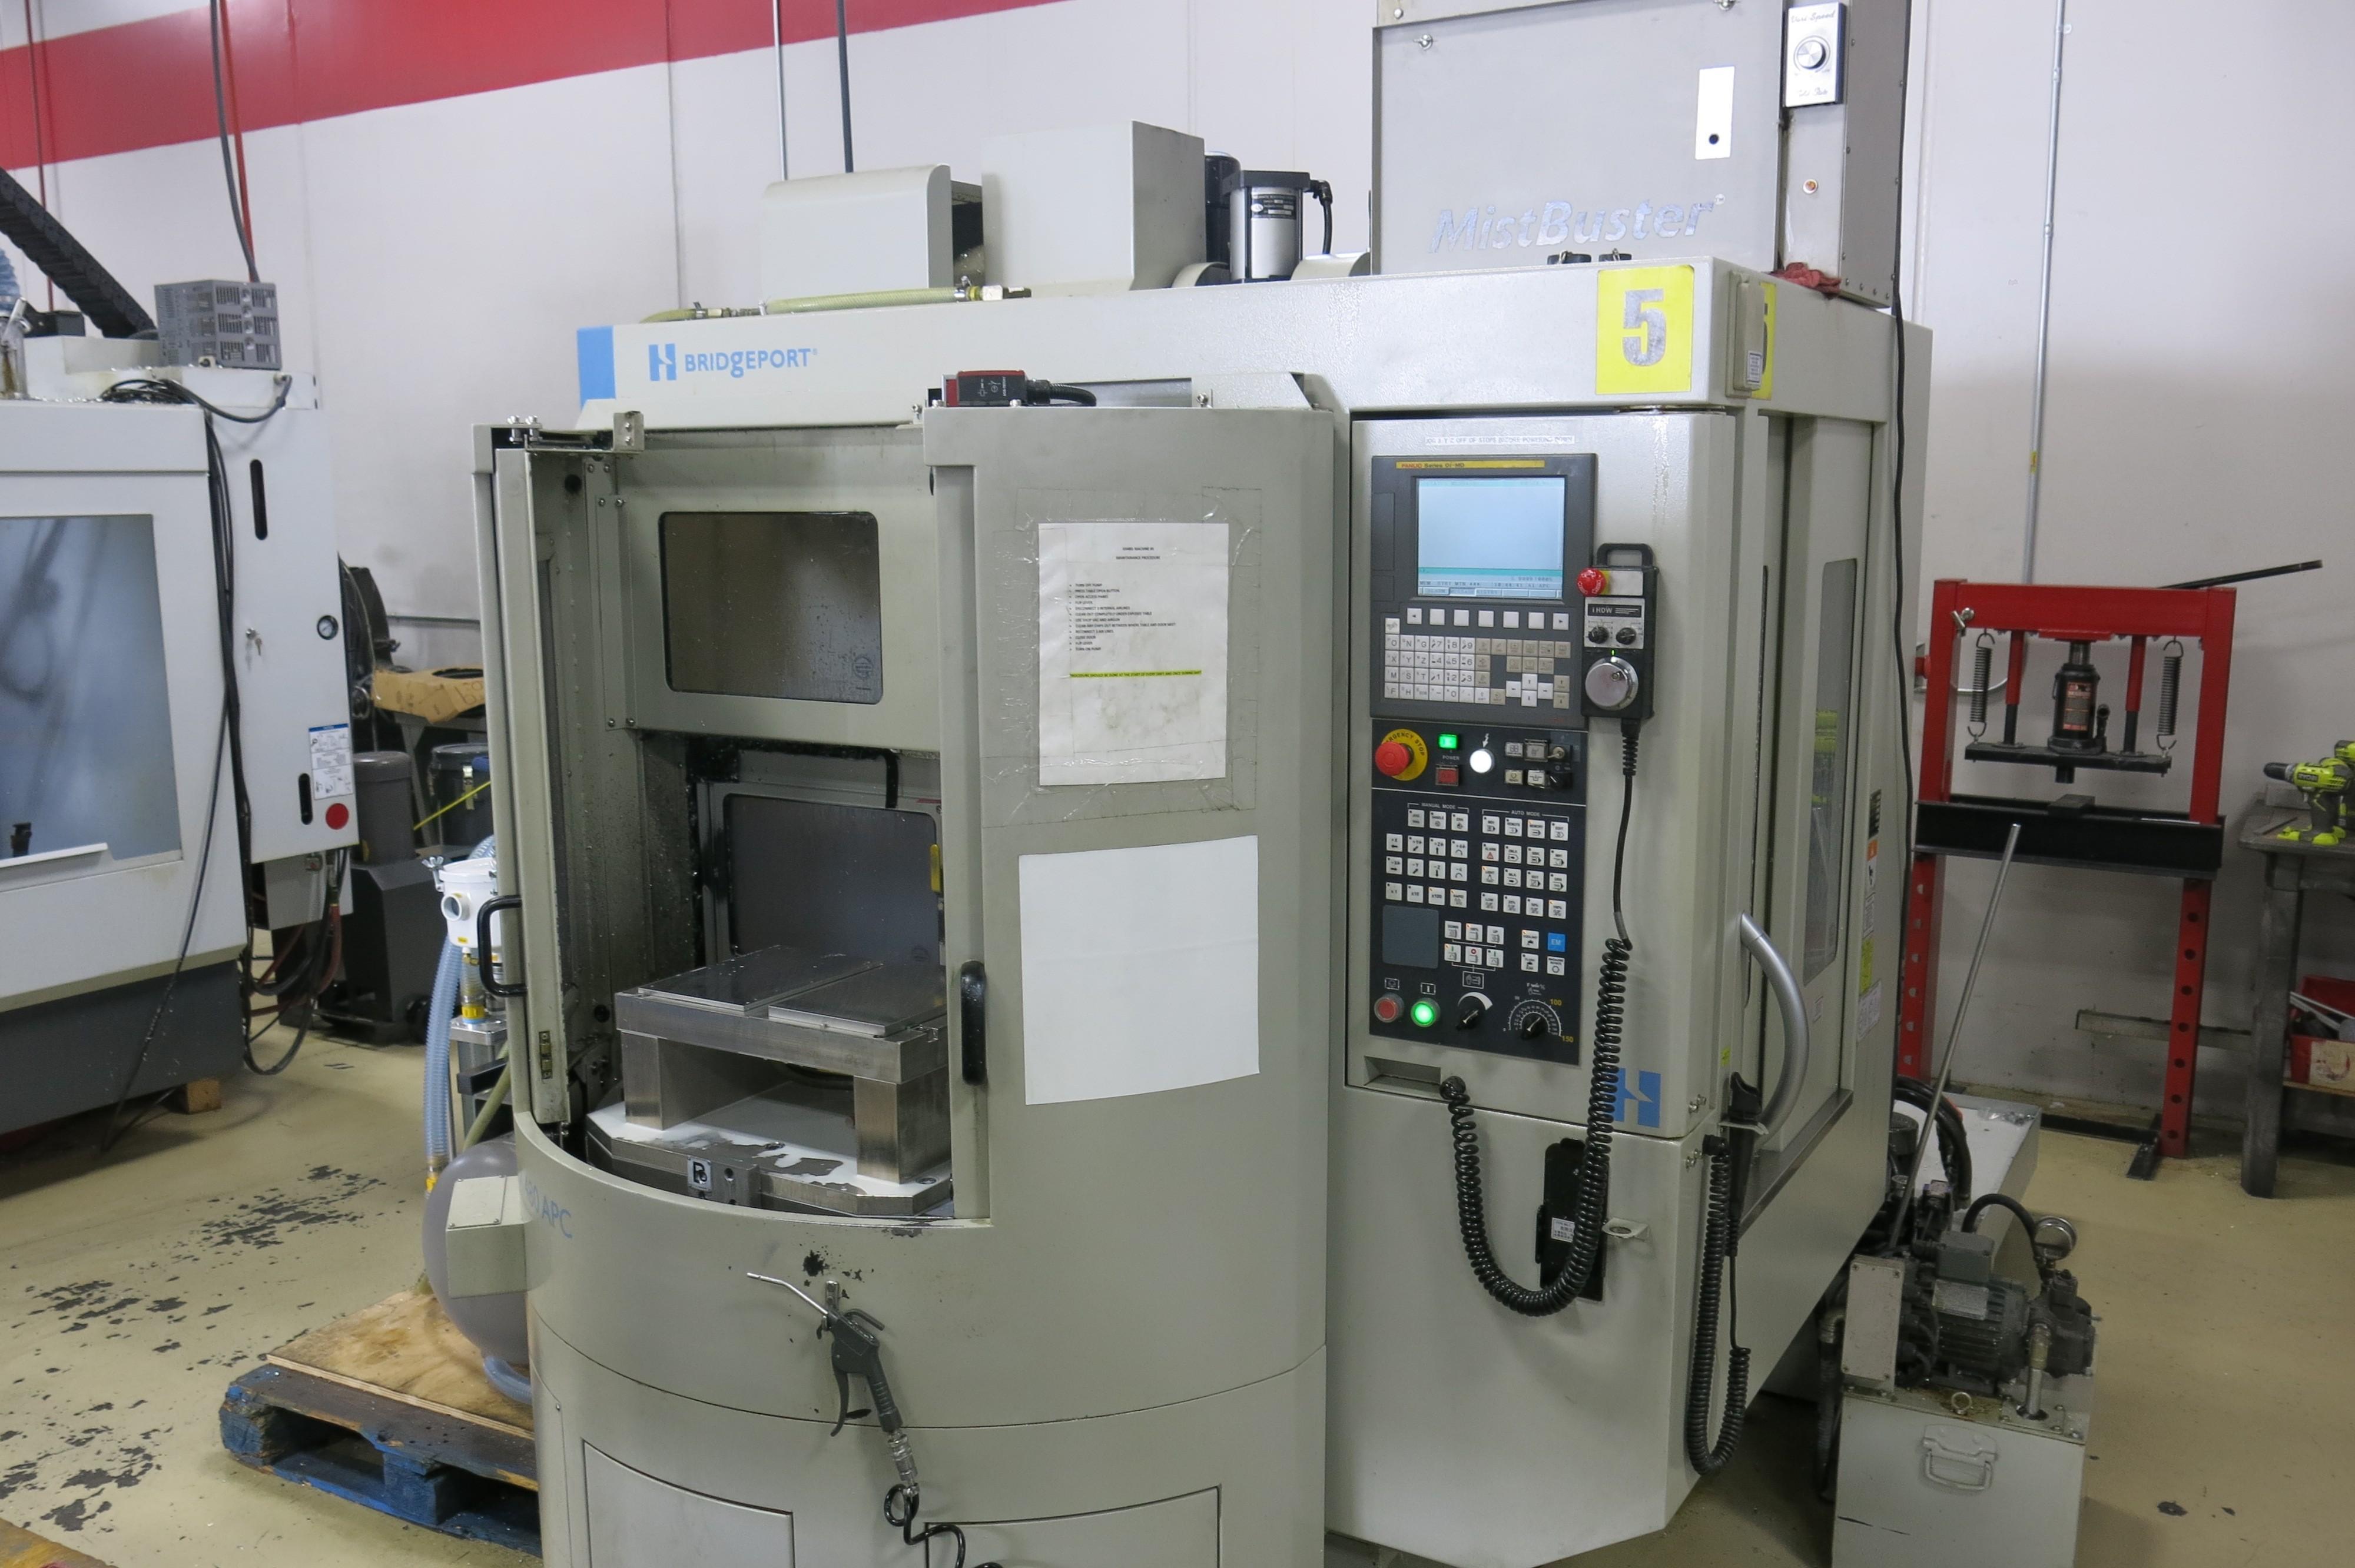 Bridgeport Model GX 480 APC CNC Vertical Machining Center, New 2014